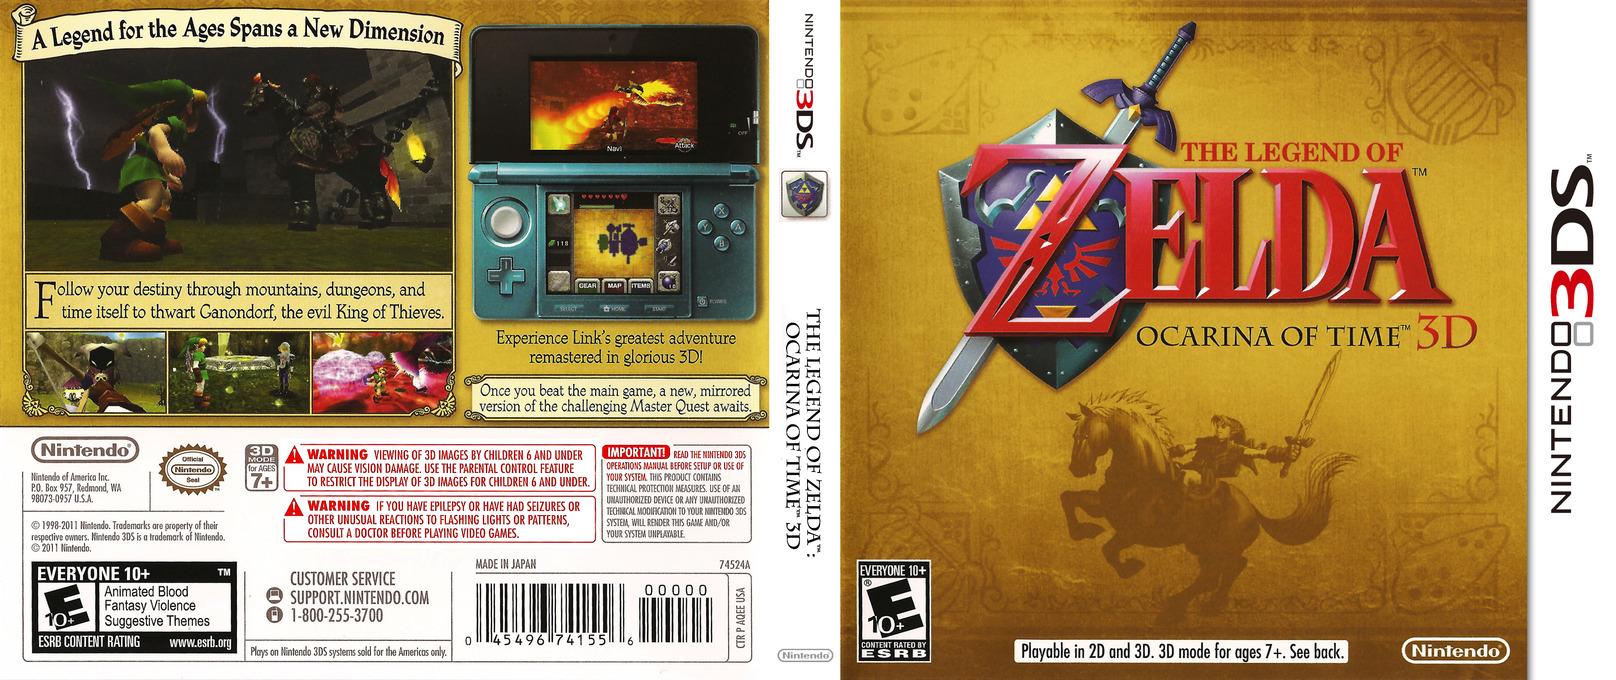 The Legend of Zelda - Ocarina of Time 3D 3DS coverfullHQ (AQEE)